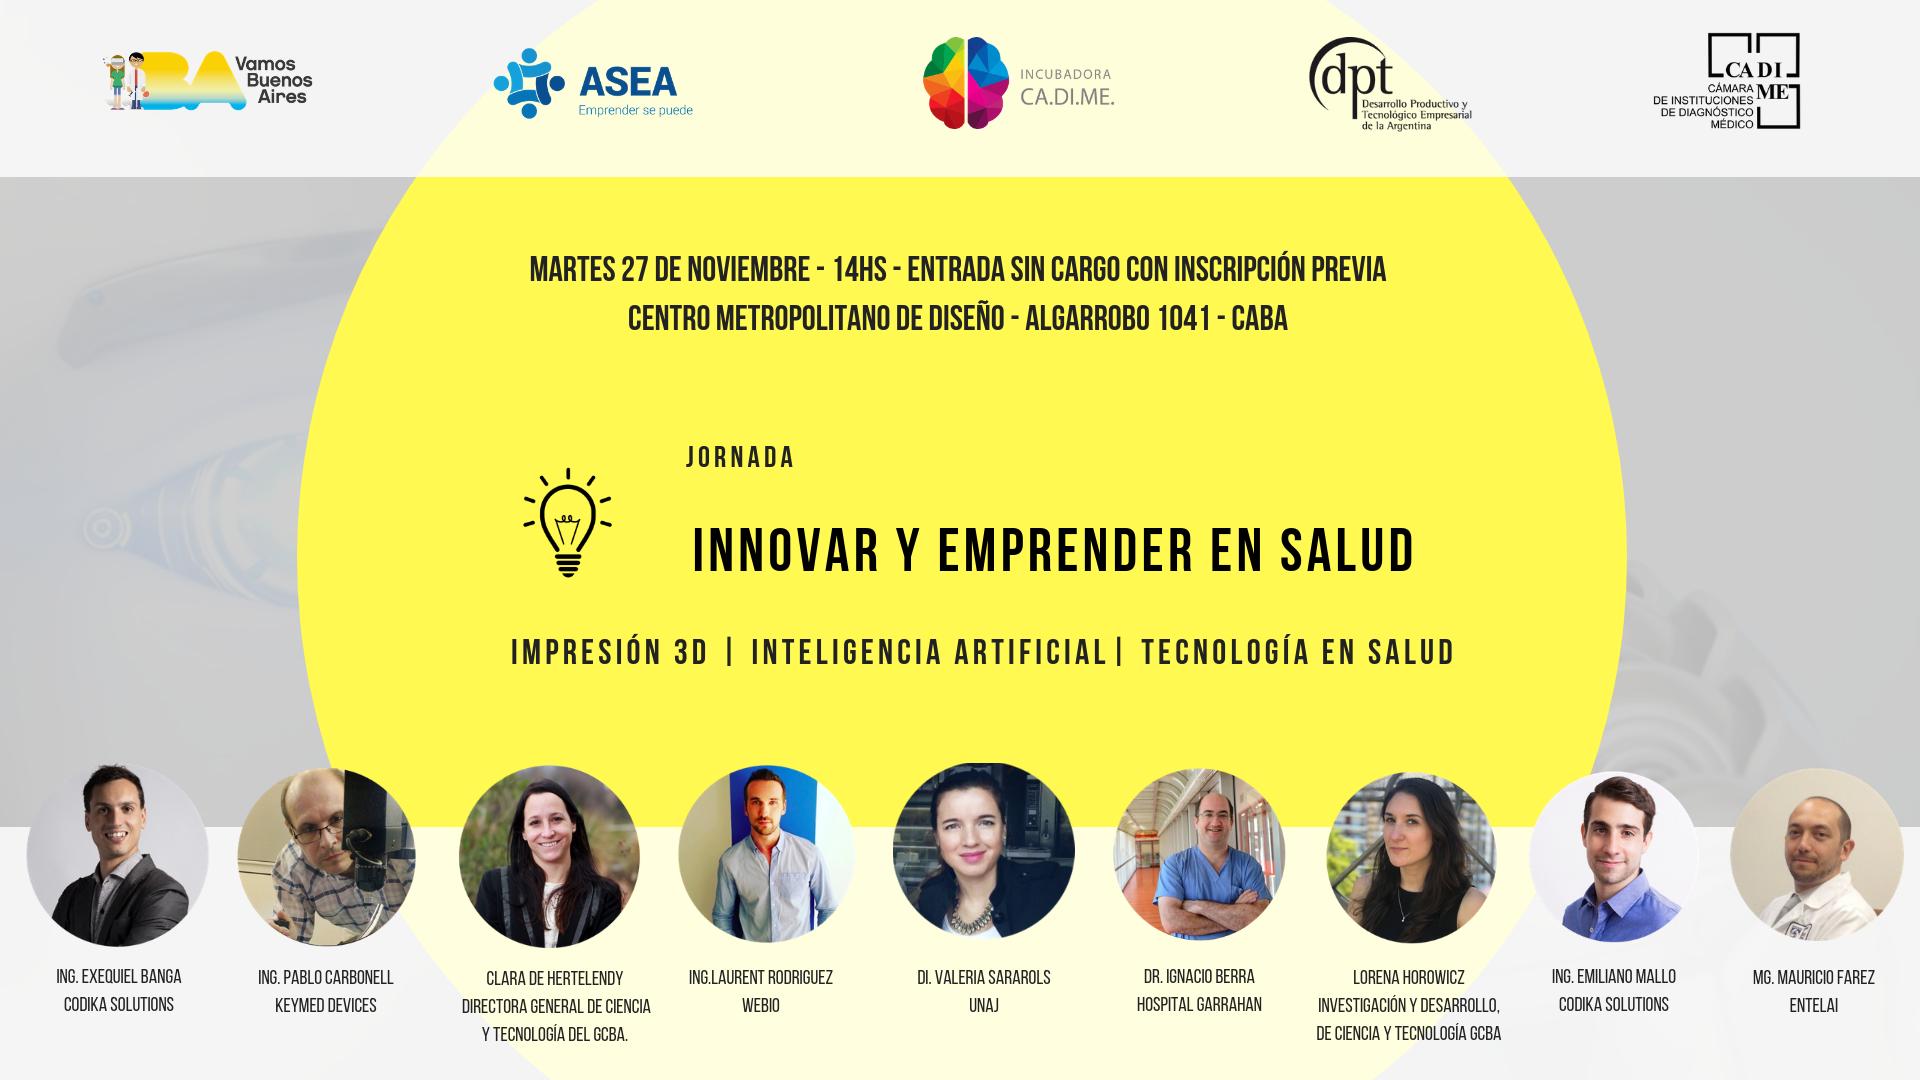 innovar y emprender en salud